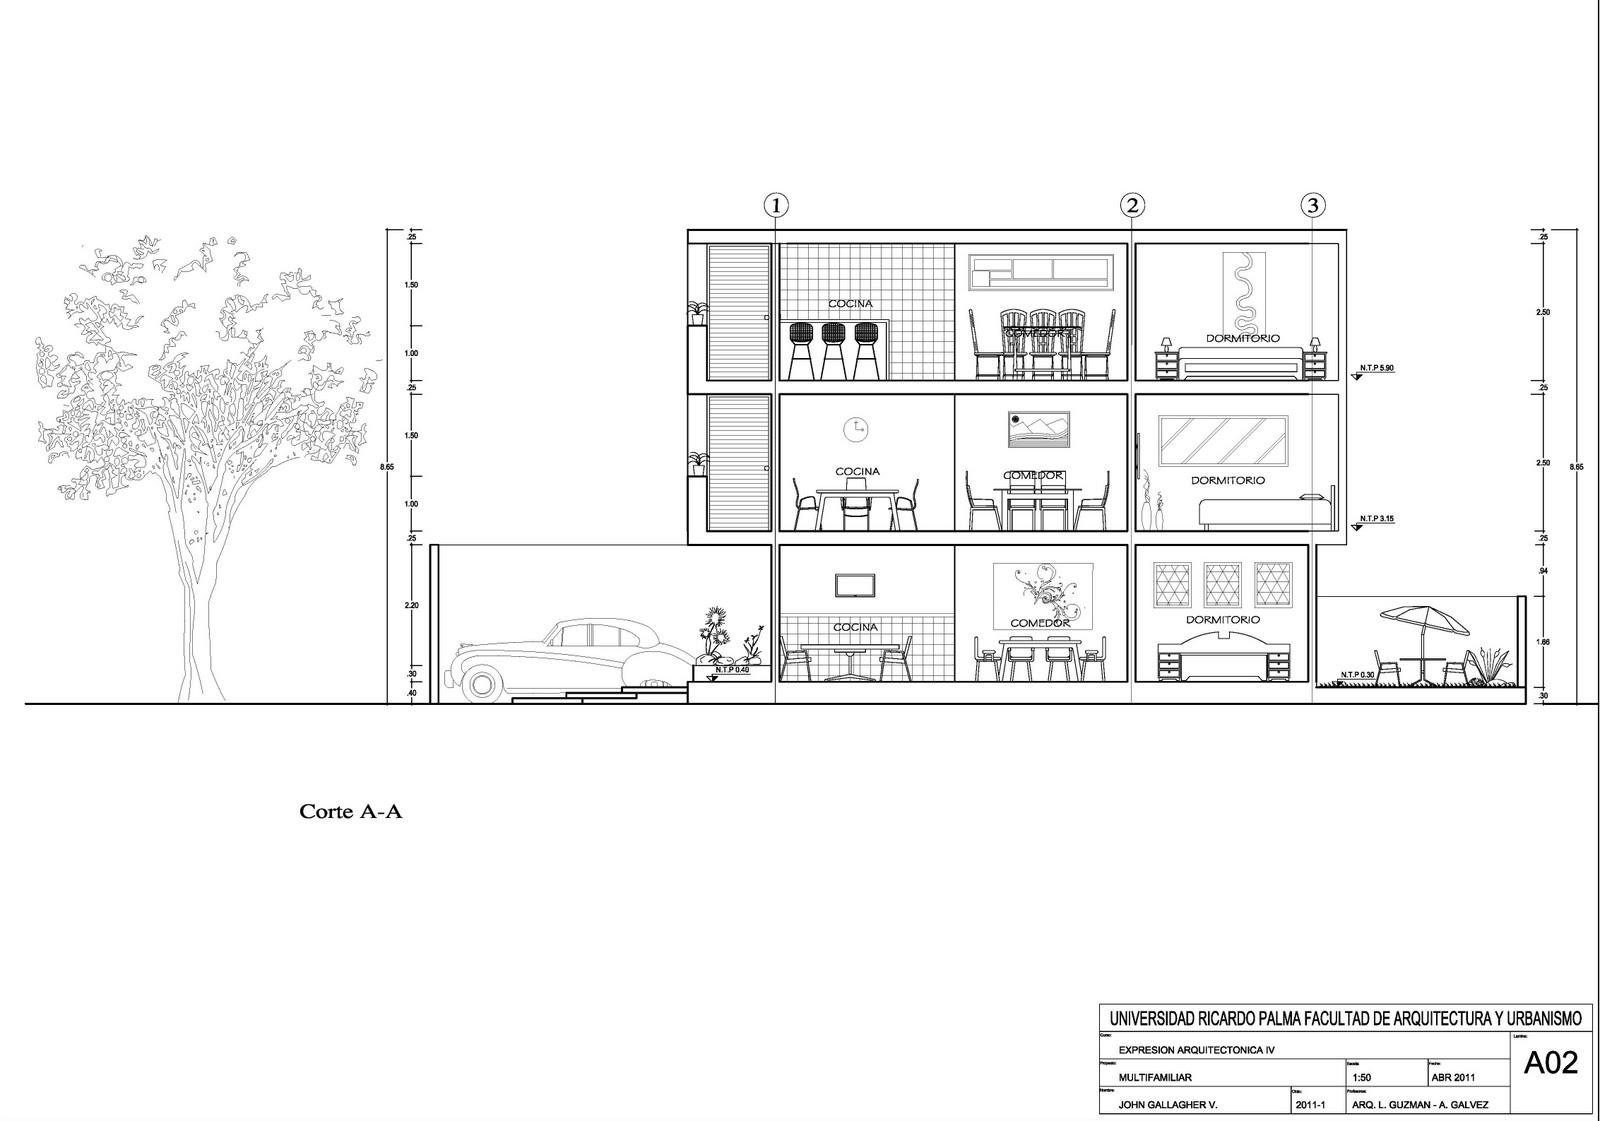 Expresi n arquitect nica 4 planos de arquitectura for Cocina plano arquitectonico